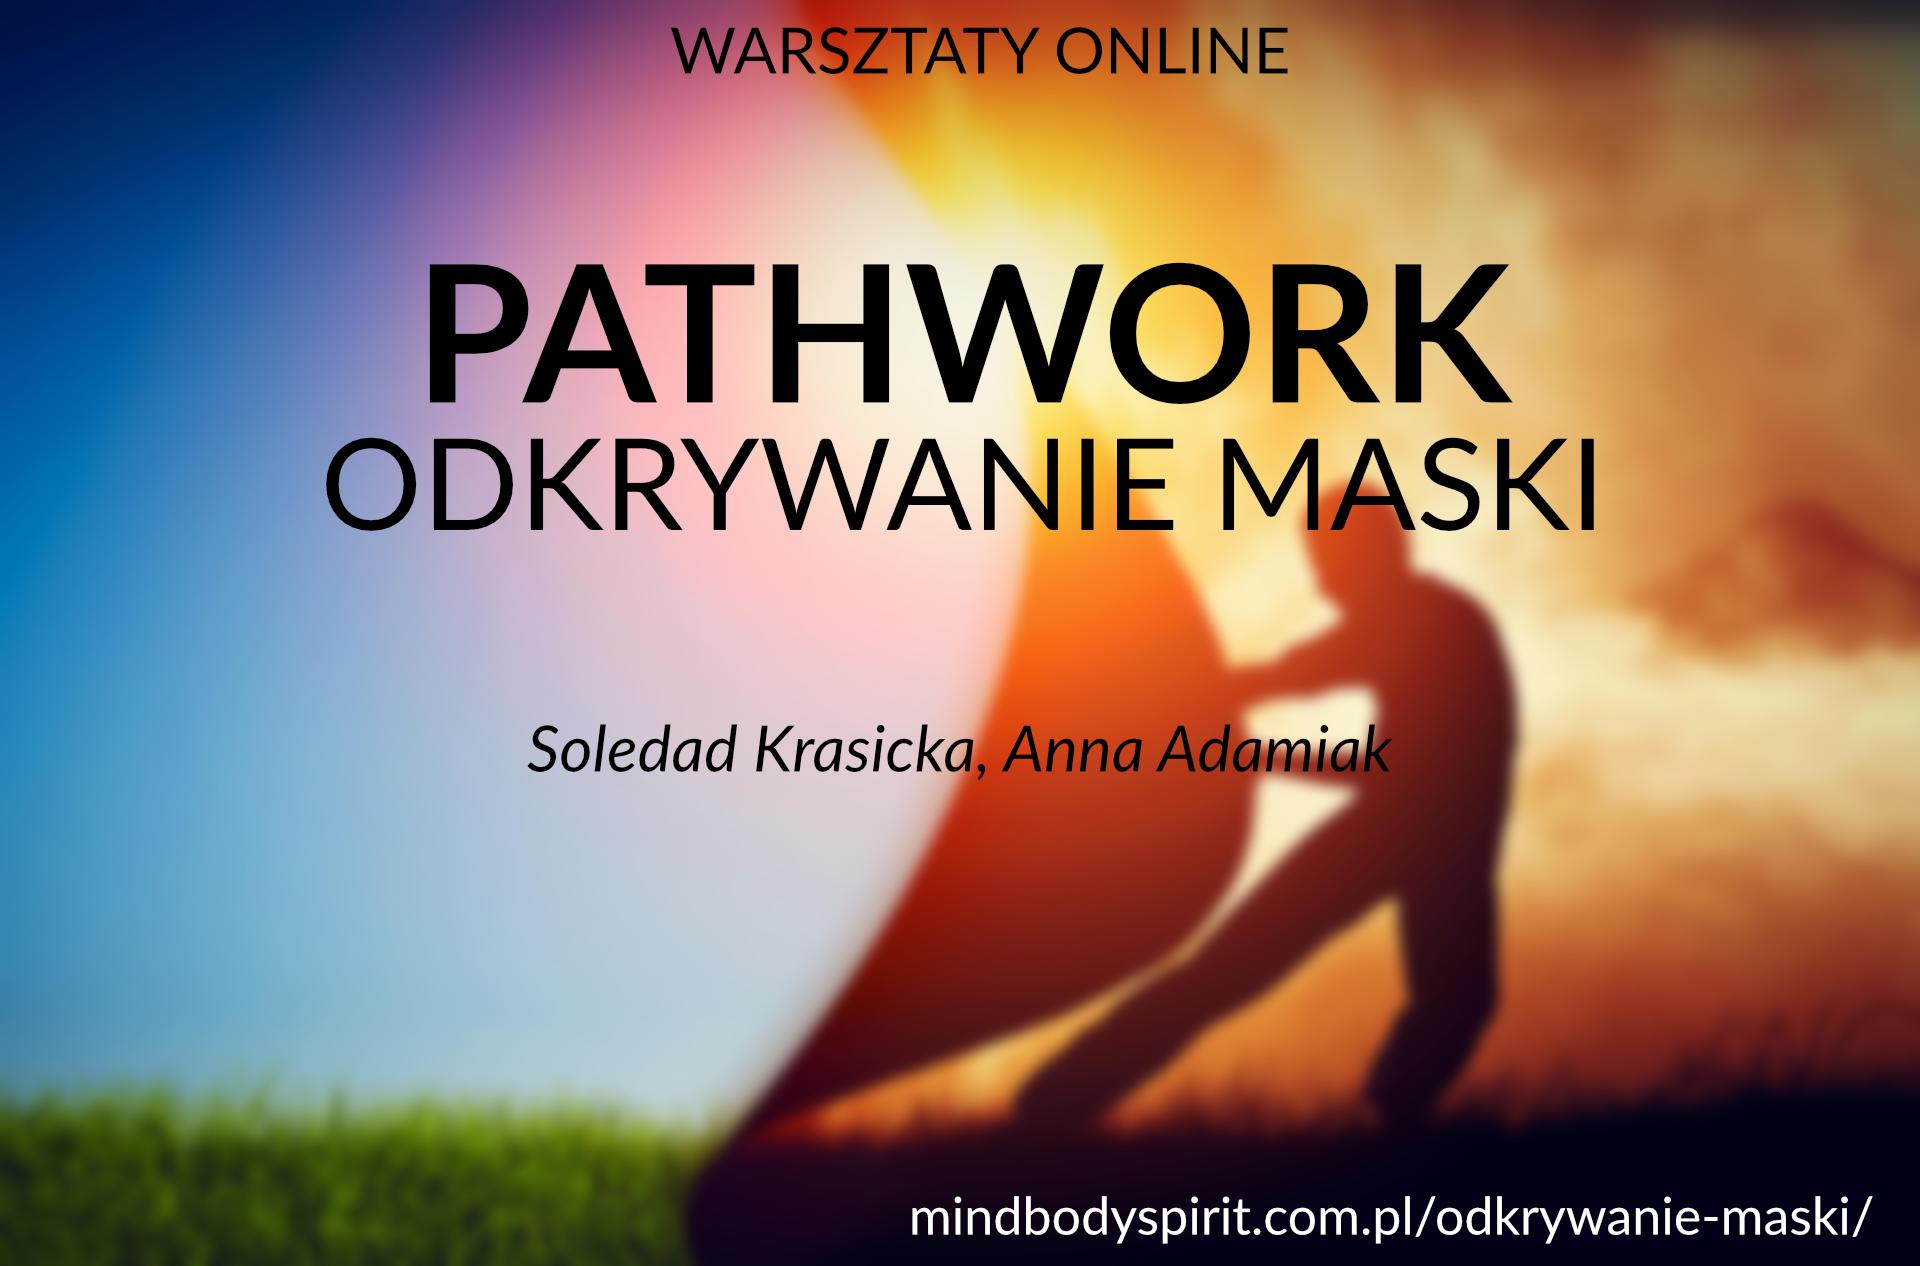 PATHWORK - odkrywanie maski - Soledad Krasicka i Anna Adamiak